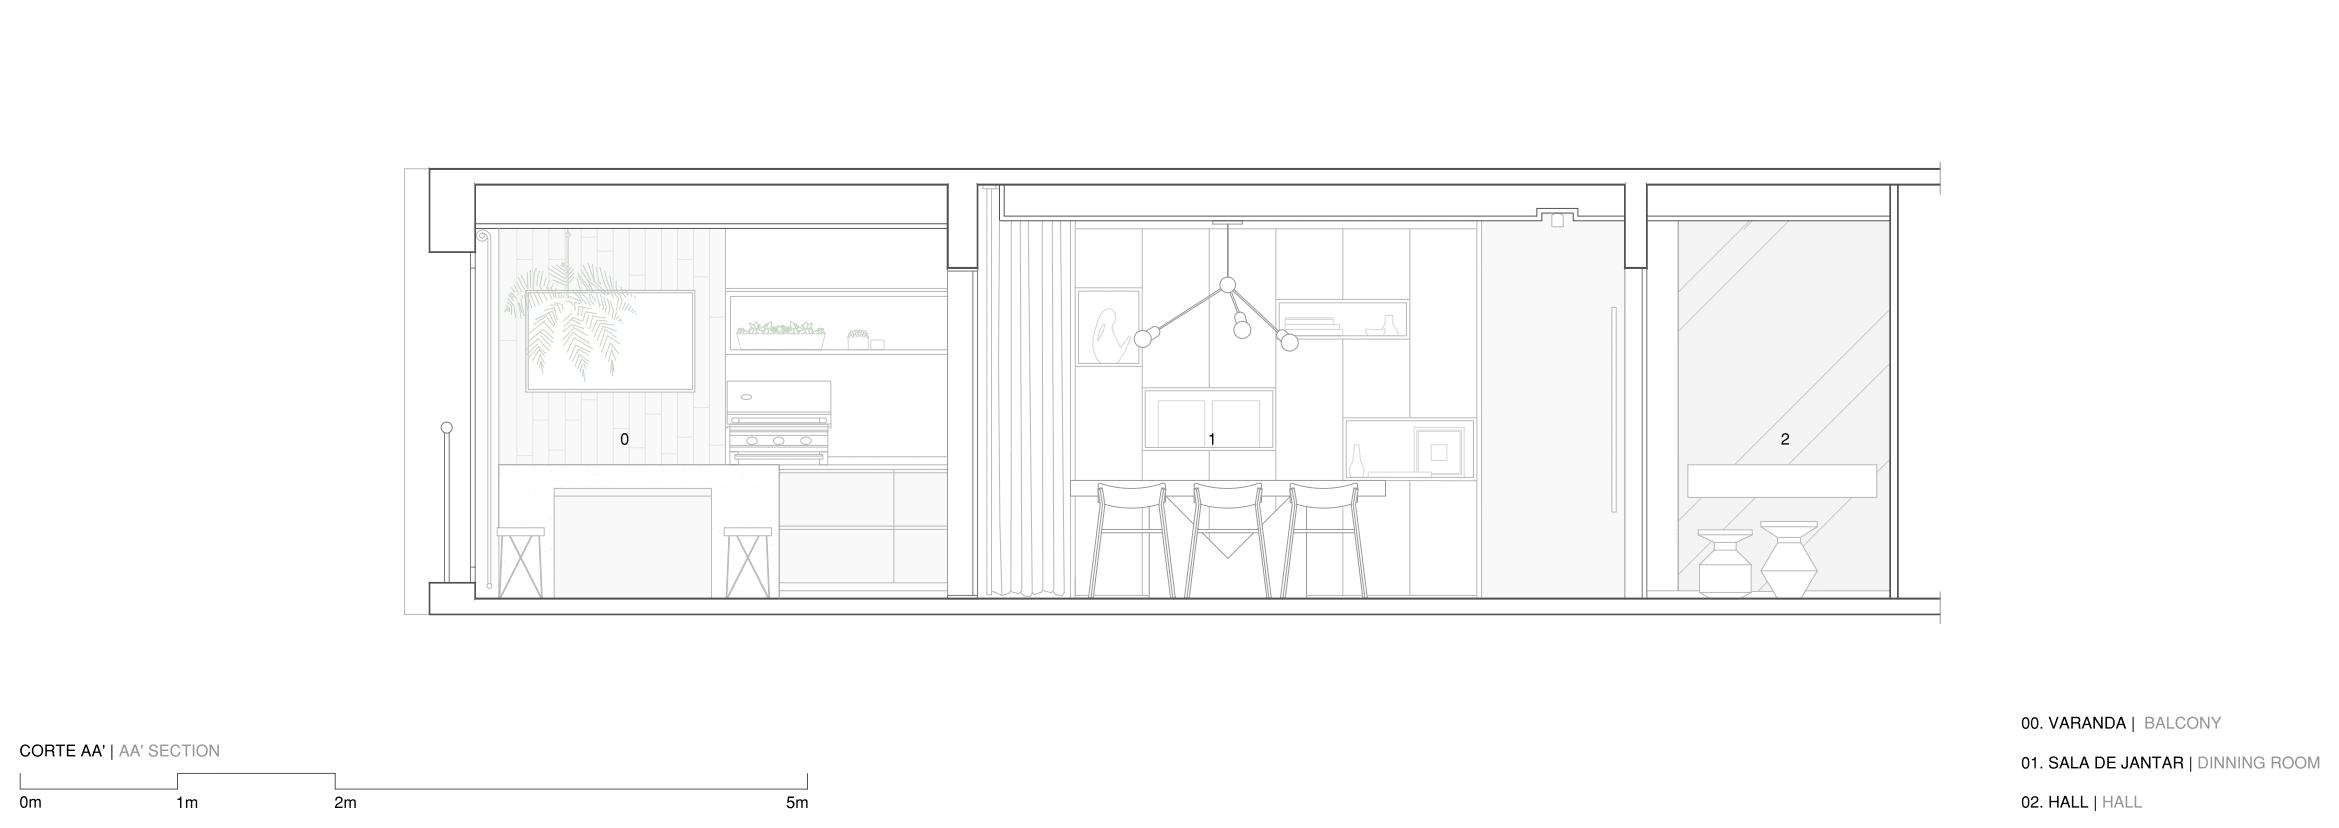 hobjeto-arquitetura-apartamento-fn-ap-02-corteaa